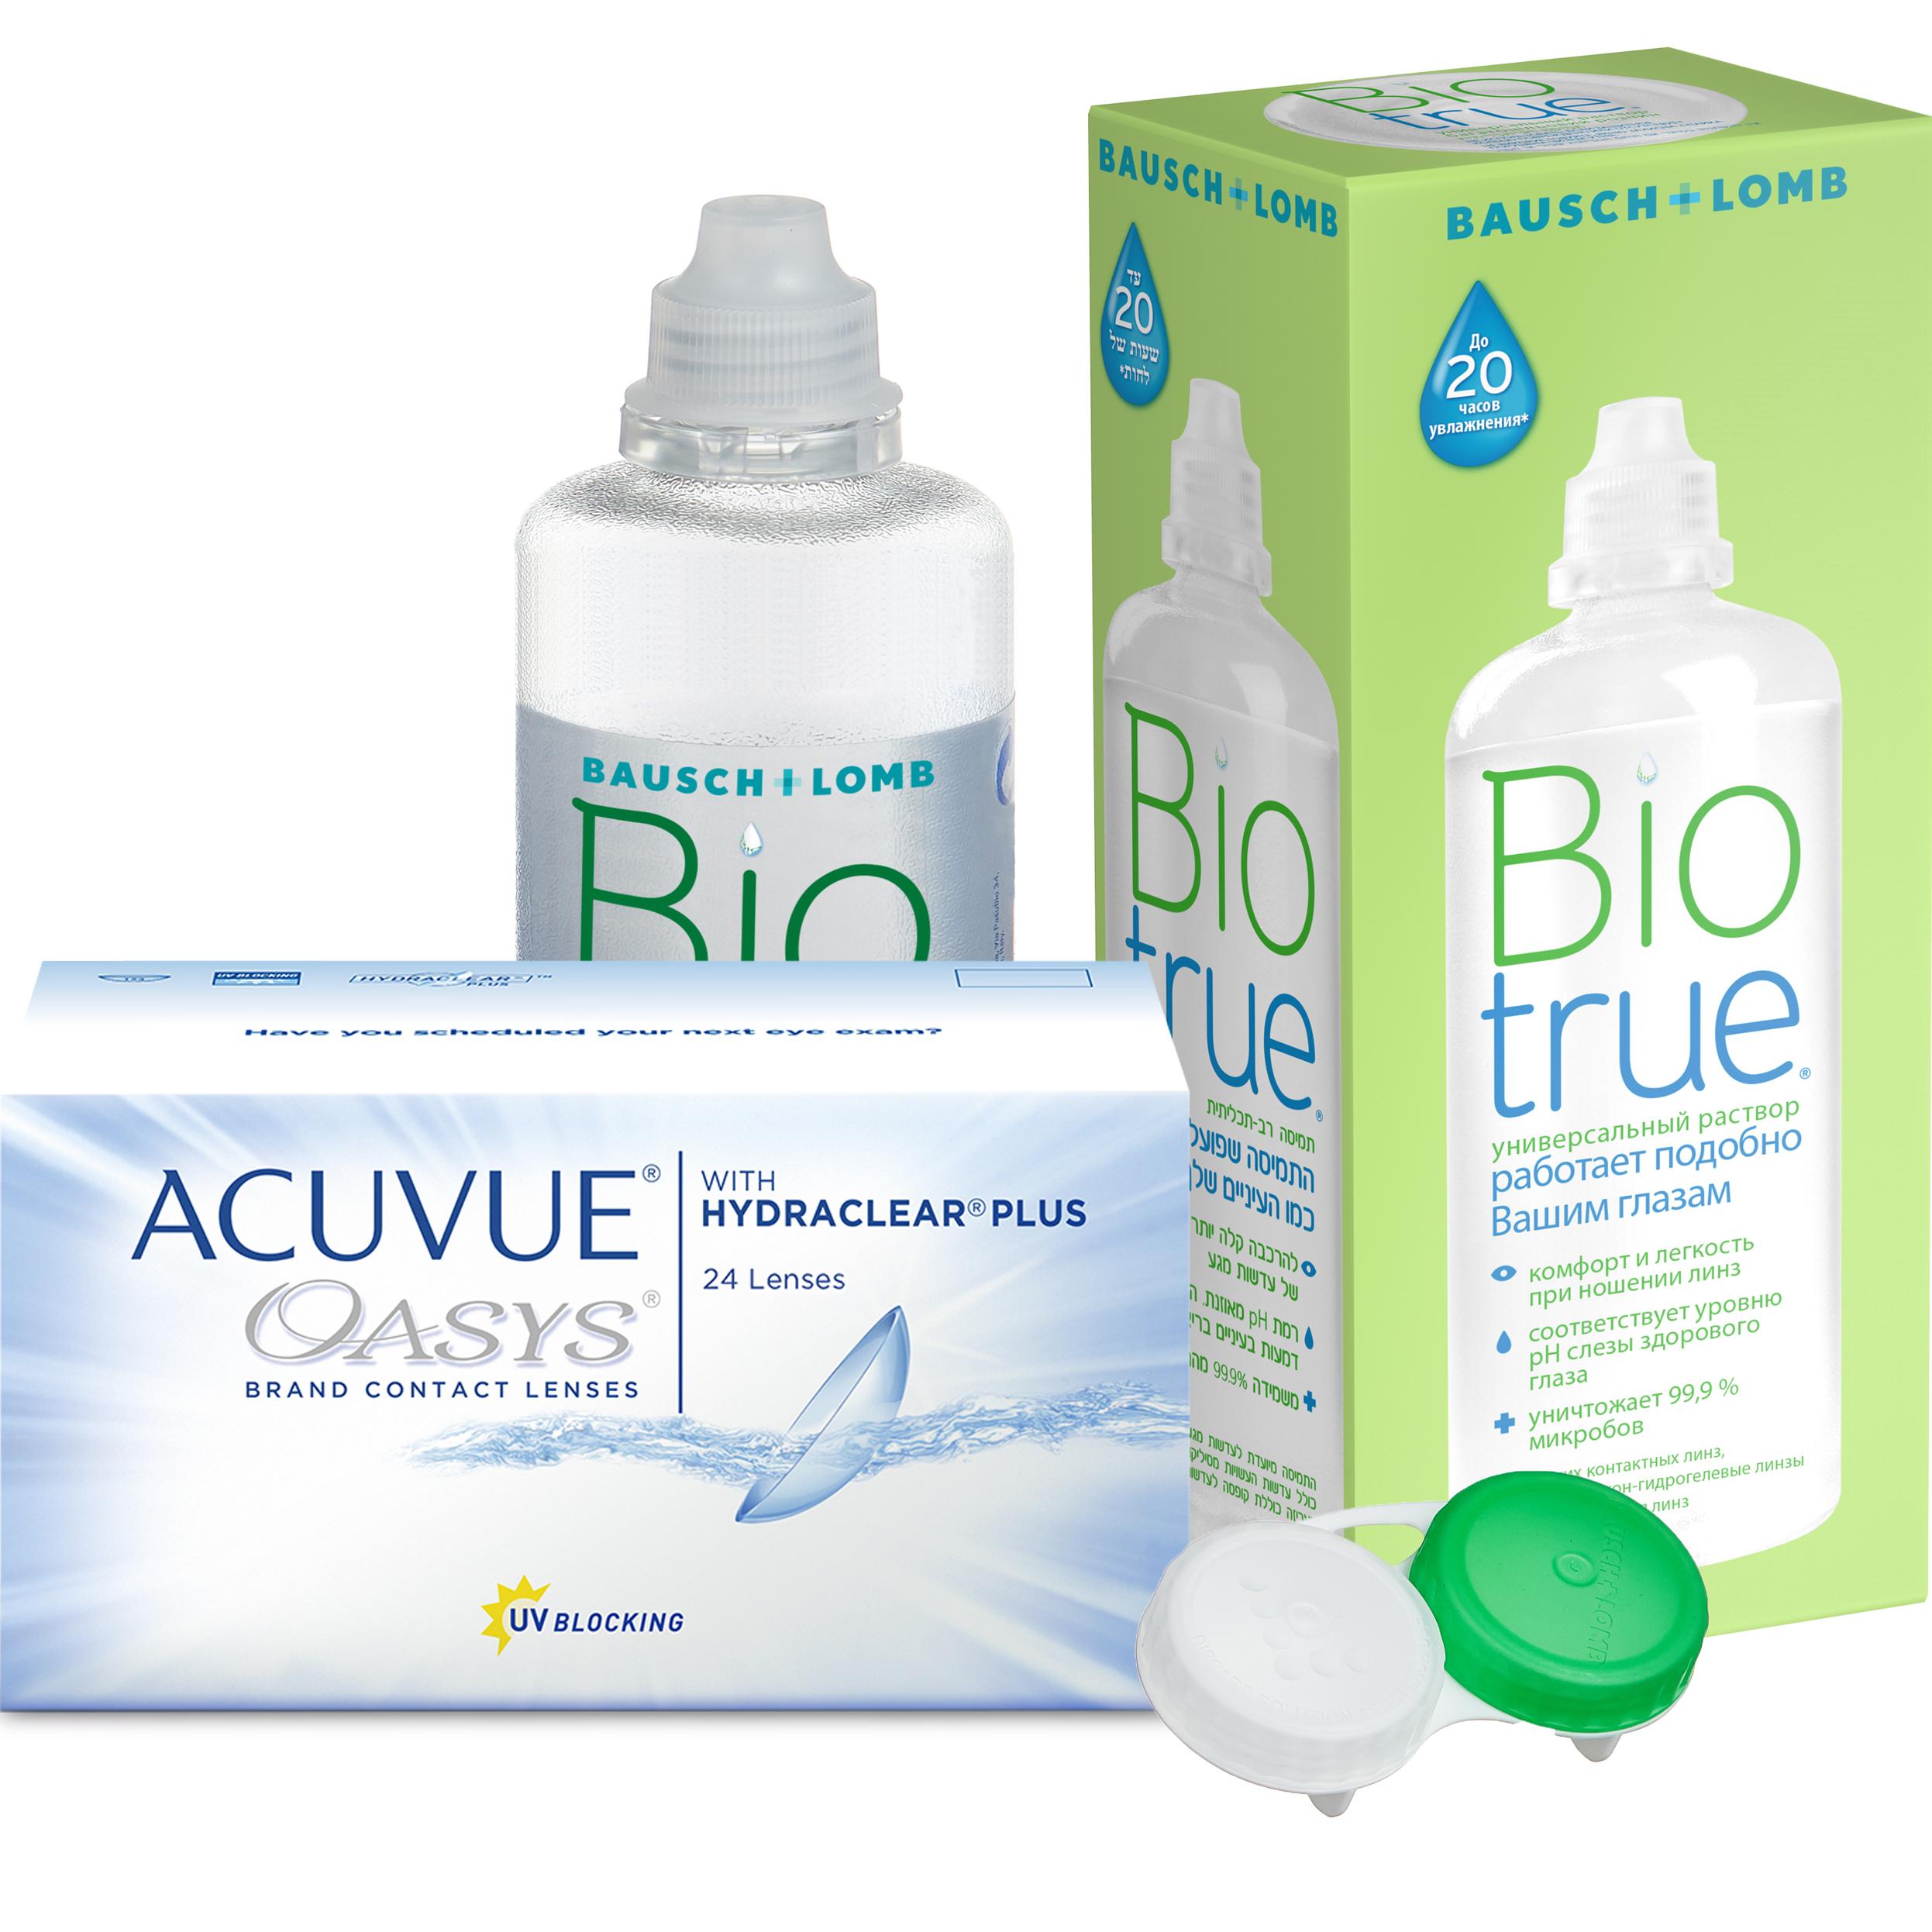 Купить Oasys with Hydraclear Plus 24 линзы + Biotrue, Контактные линзы Acuvue Oasys with Hydraclear Plus 24 линзы R 8.4 -5, 50 + Biotrue 300 мл